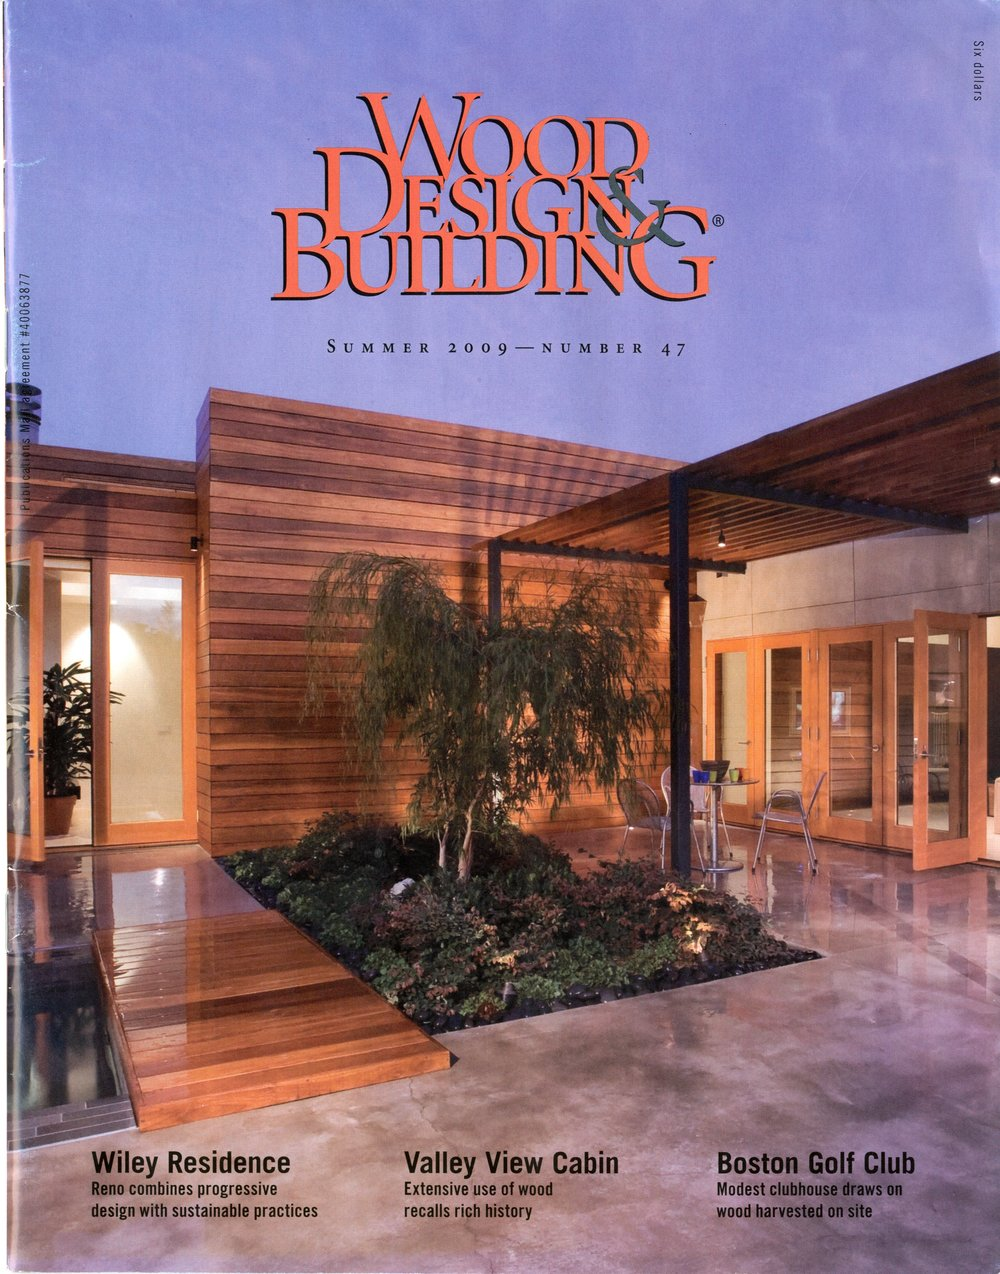 Wood Design Building001.jpg